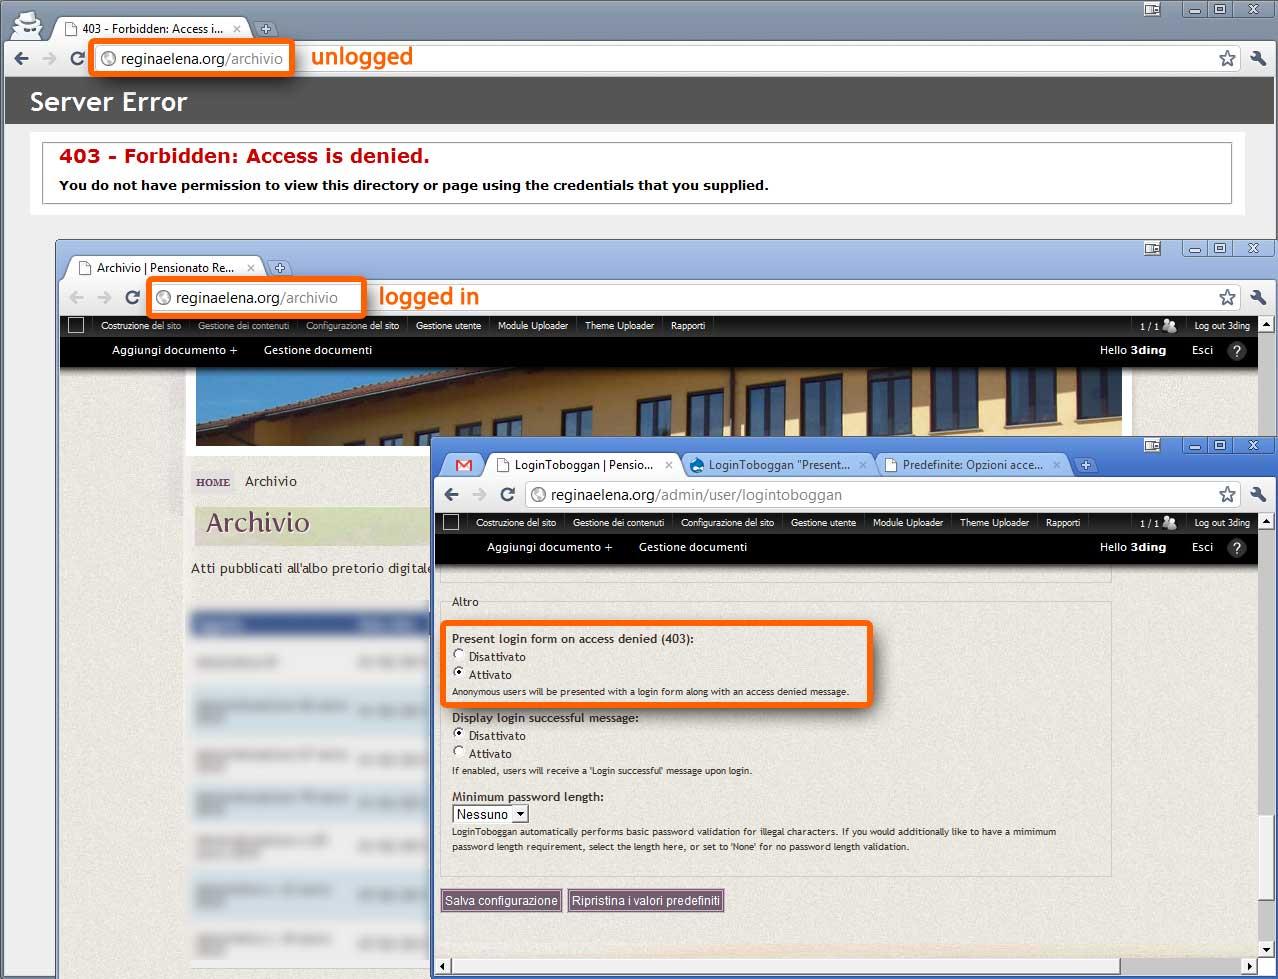 403 login form does not work on IIS 7 (windows server